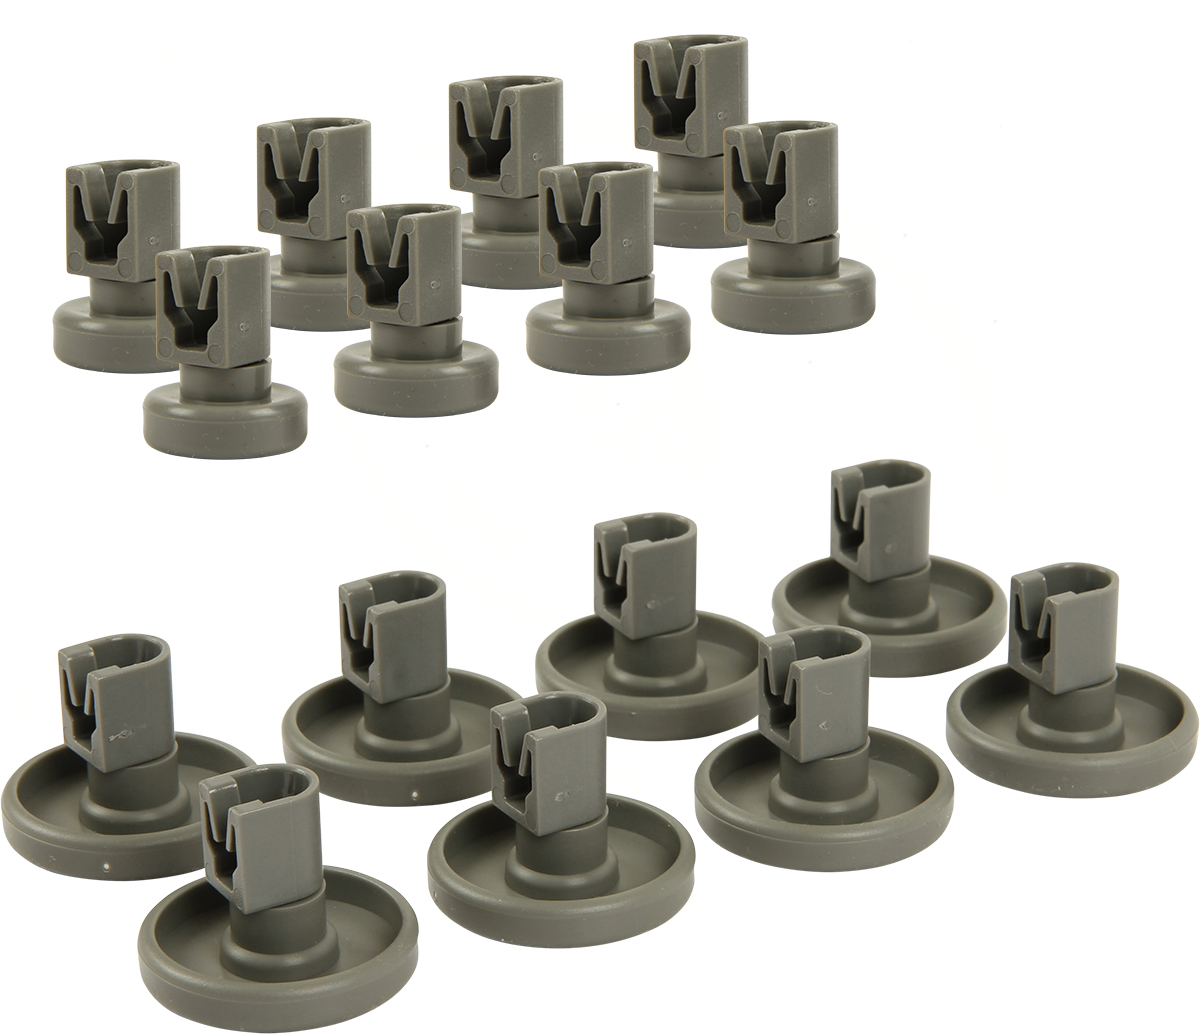 2x 8 Geschirrspüler Korbrollen Unterkorb Oberkorb für AEG Privileg Spülmaschine